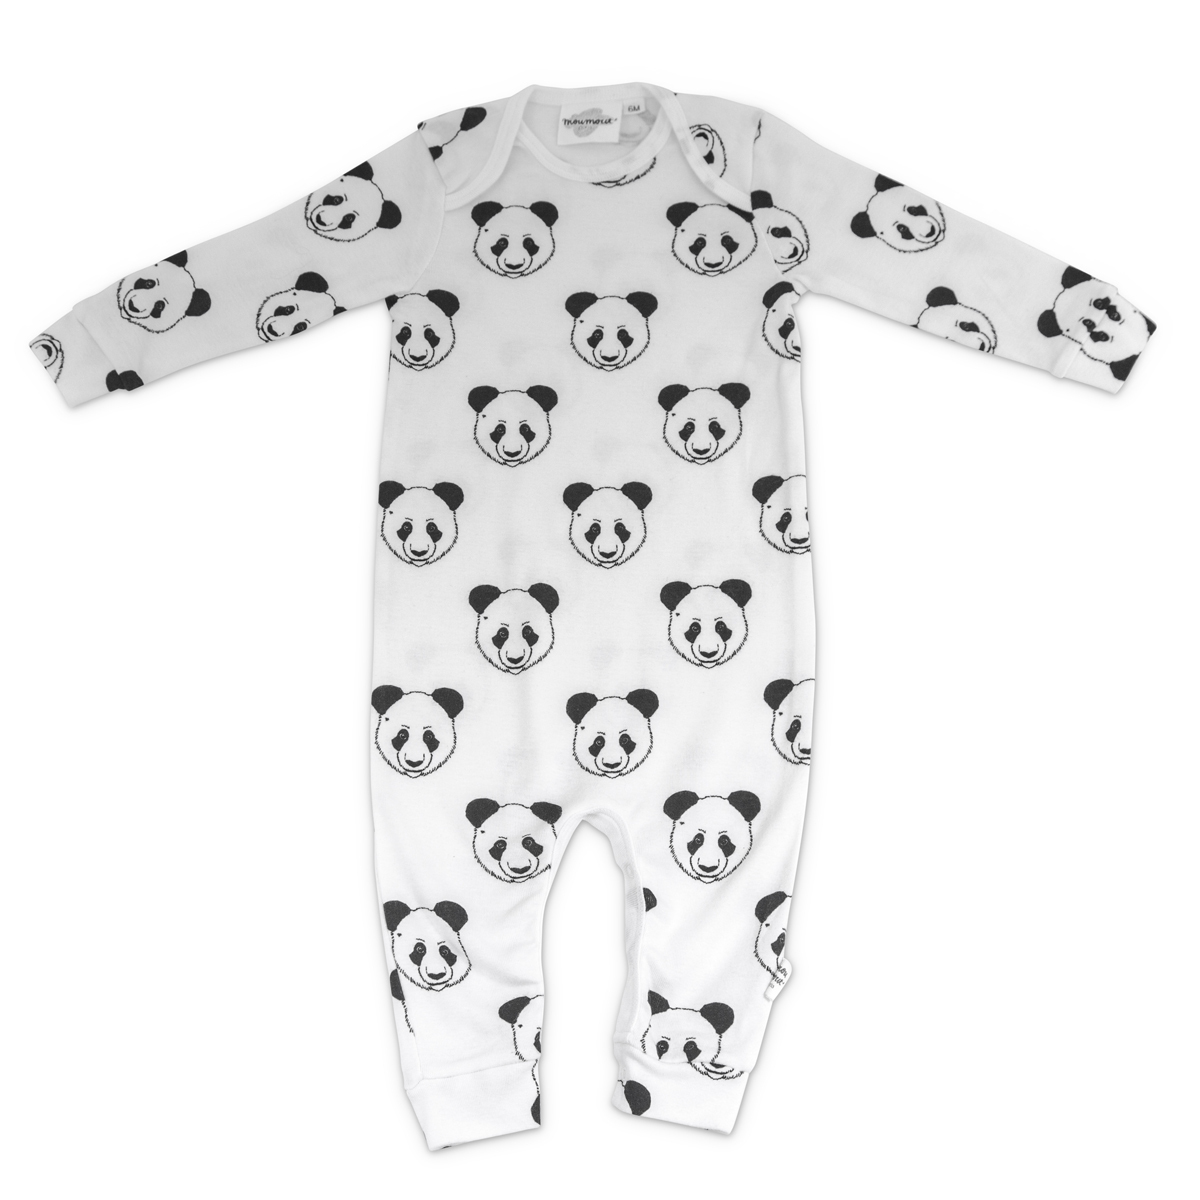 moumout pyjama bobo sans pieds panda 24 mois body pyjama moumout sur l 39 armoire de b b. Black Bedroom Furniture Sets. Home Design Ideas